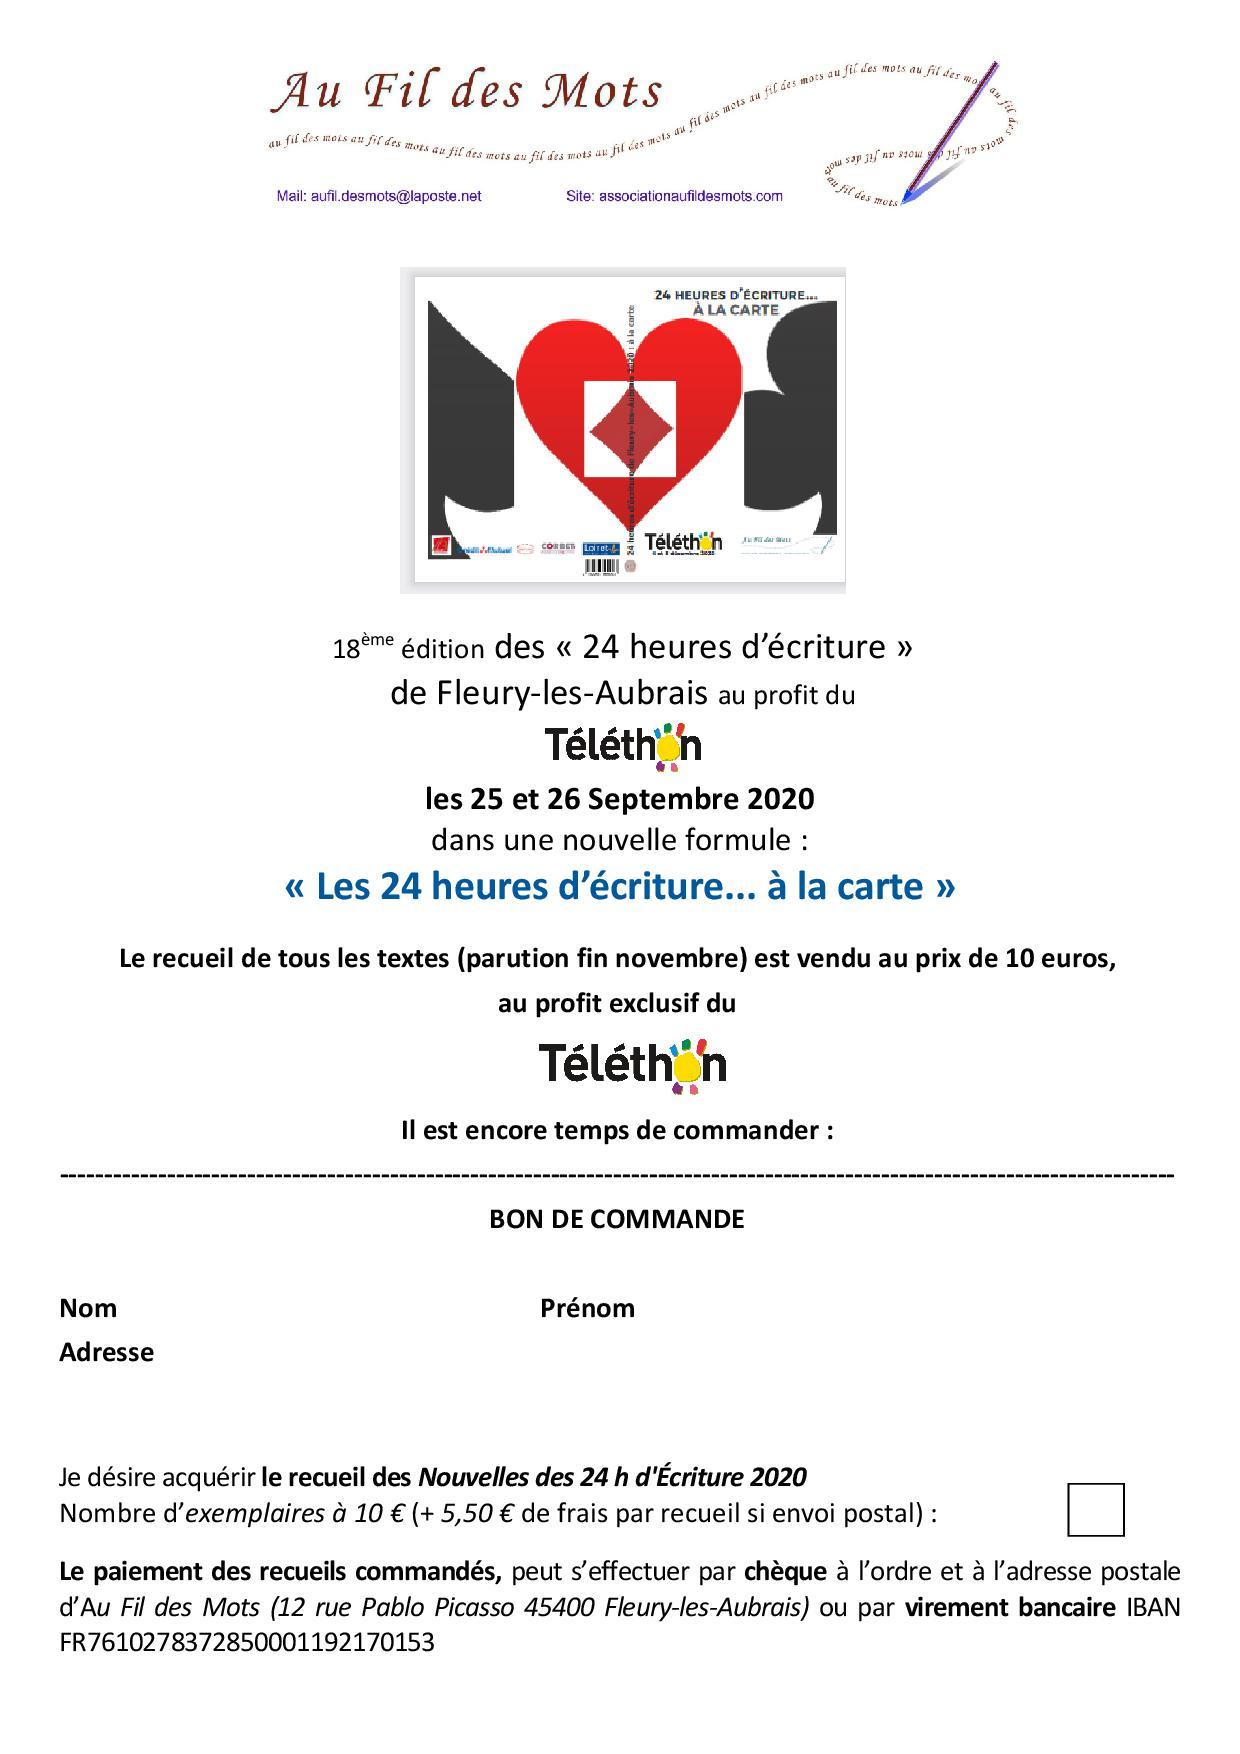 Bon_de_commande_recueil_24h_2020.jpg